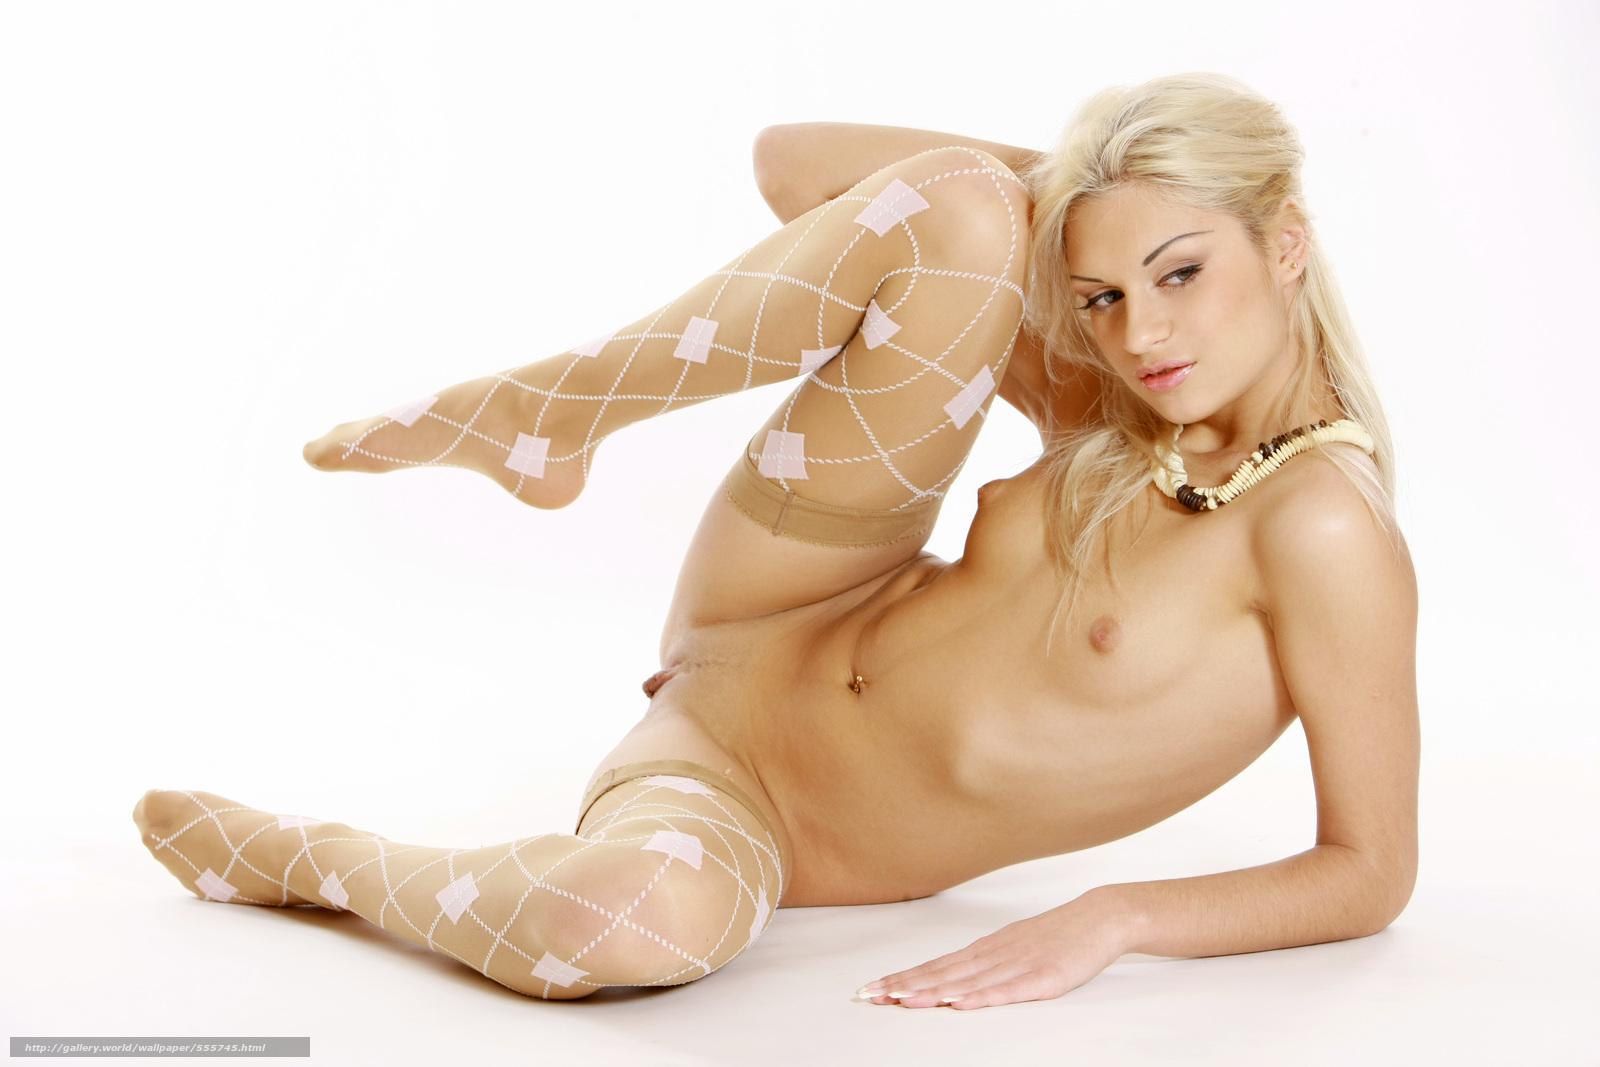 glamurnie-golie-modeli